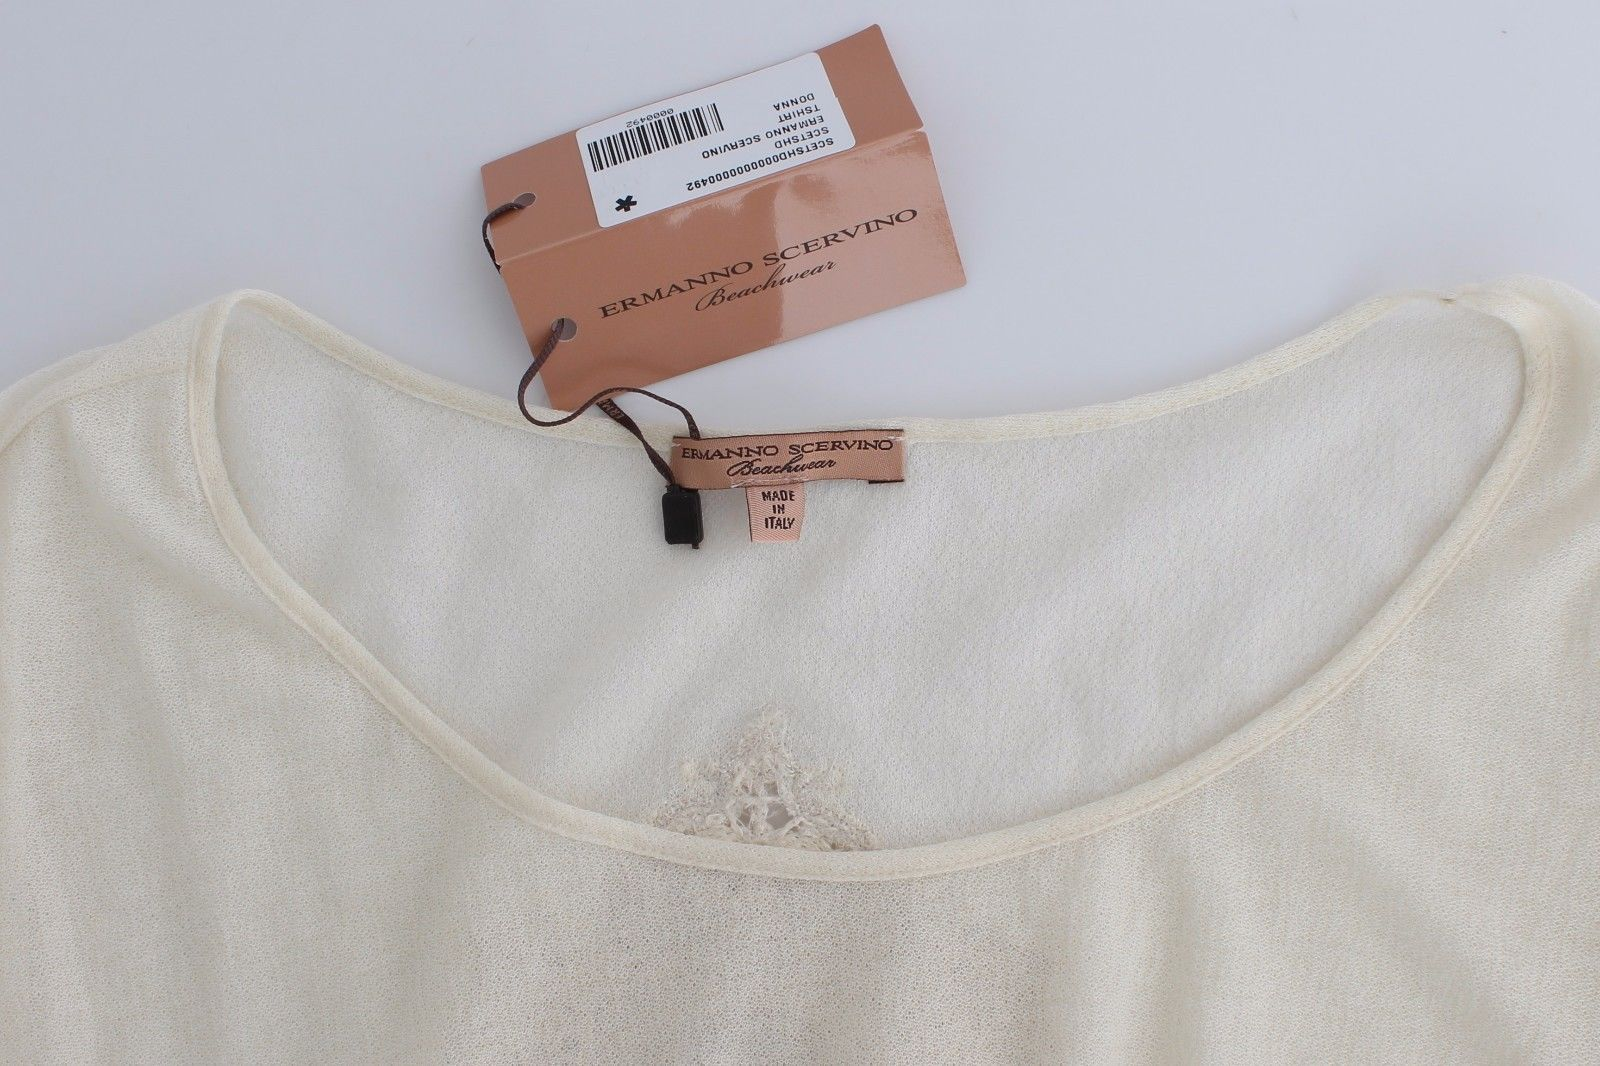 Ermanno Scervino Beachwear White T-Shirt Top Blouse